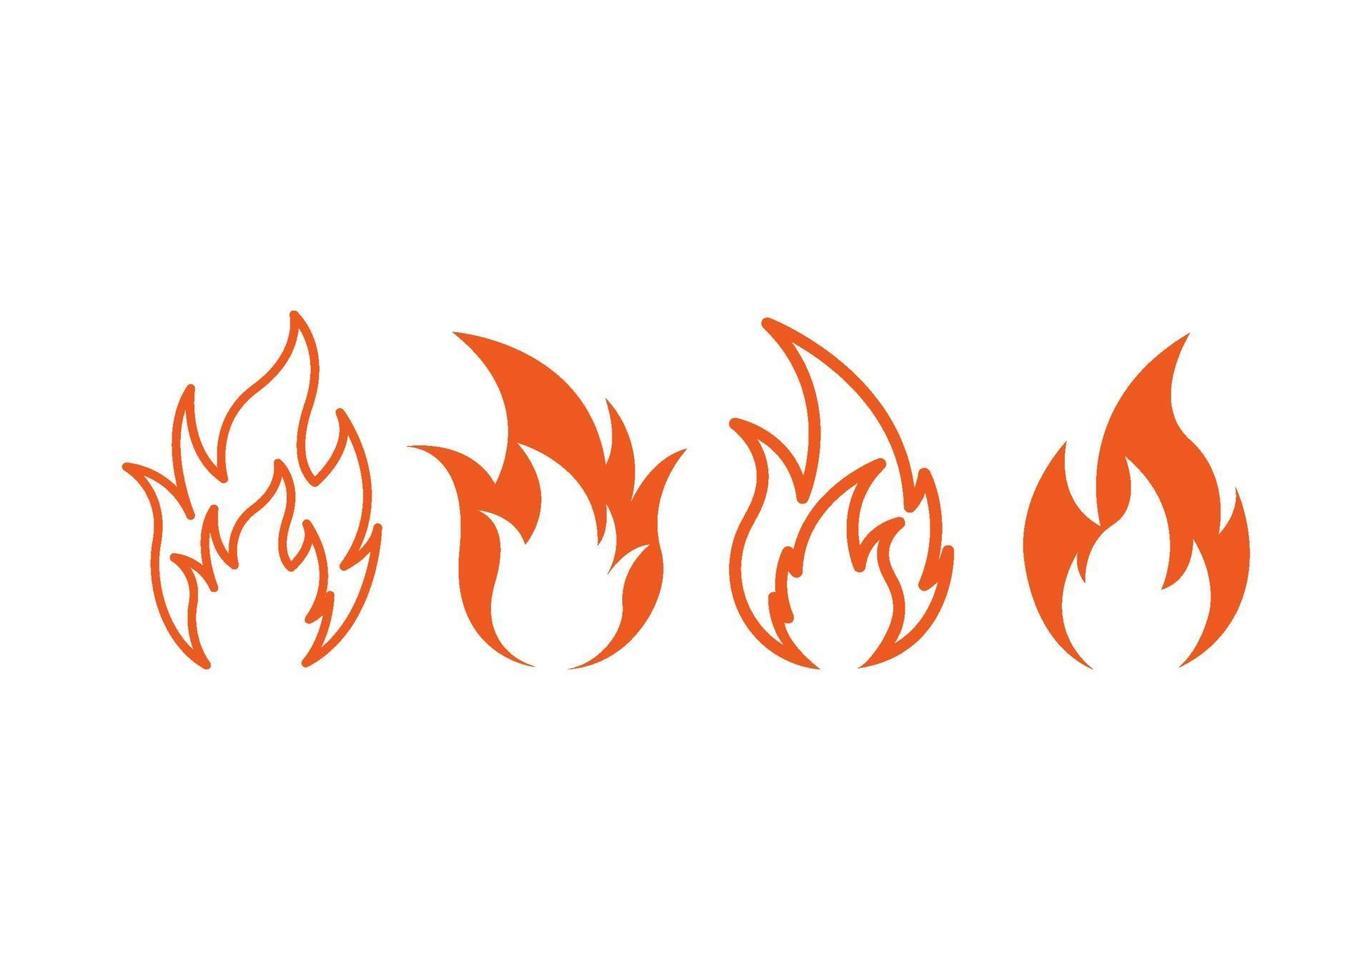 jeu d & # 39; icônes de feu illustration vectorielle vecteur